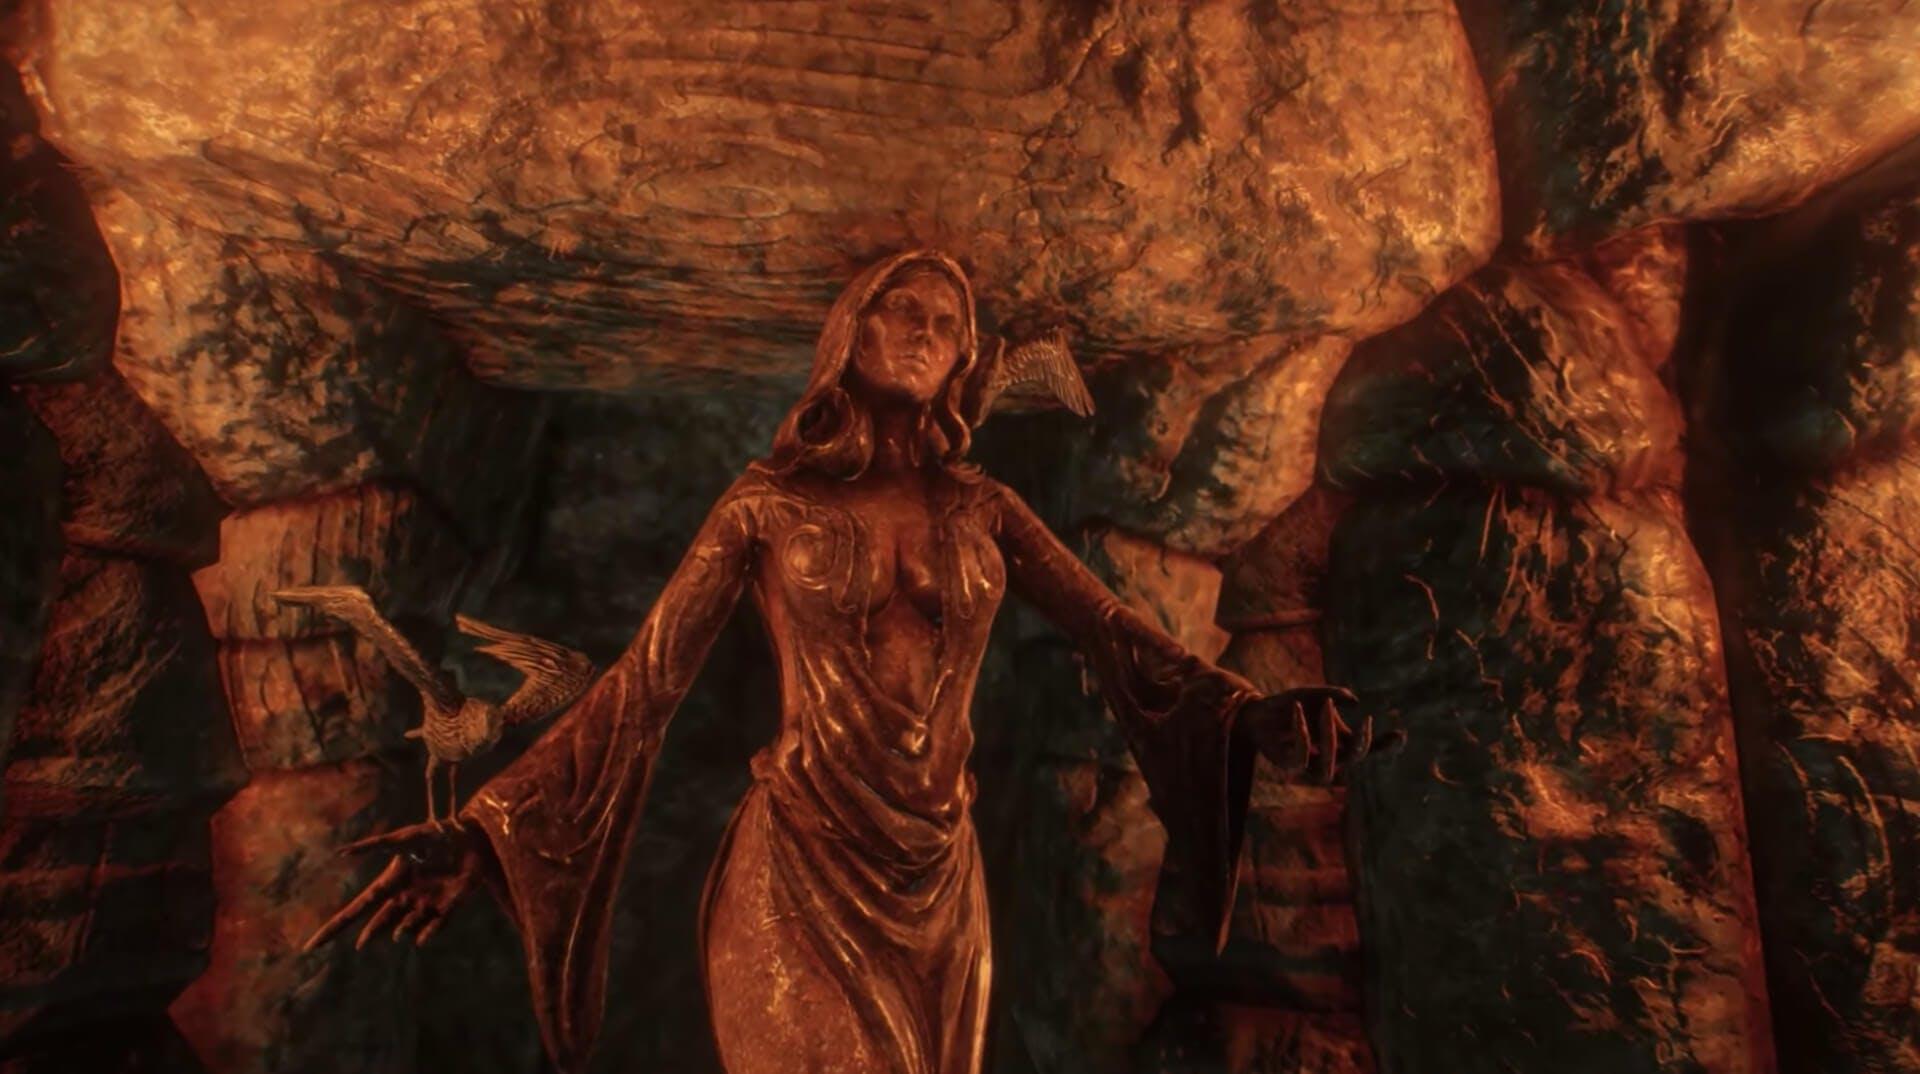 skyrim Thieves Guild - nocturnal